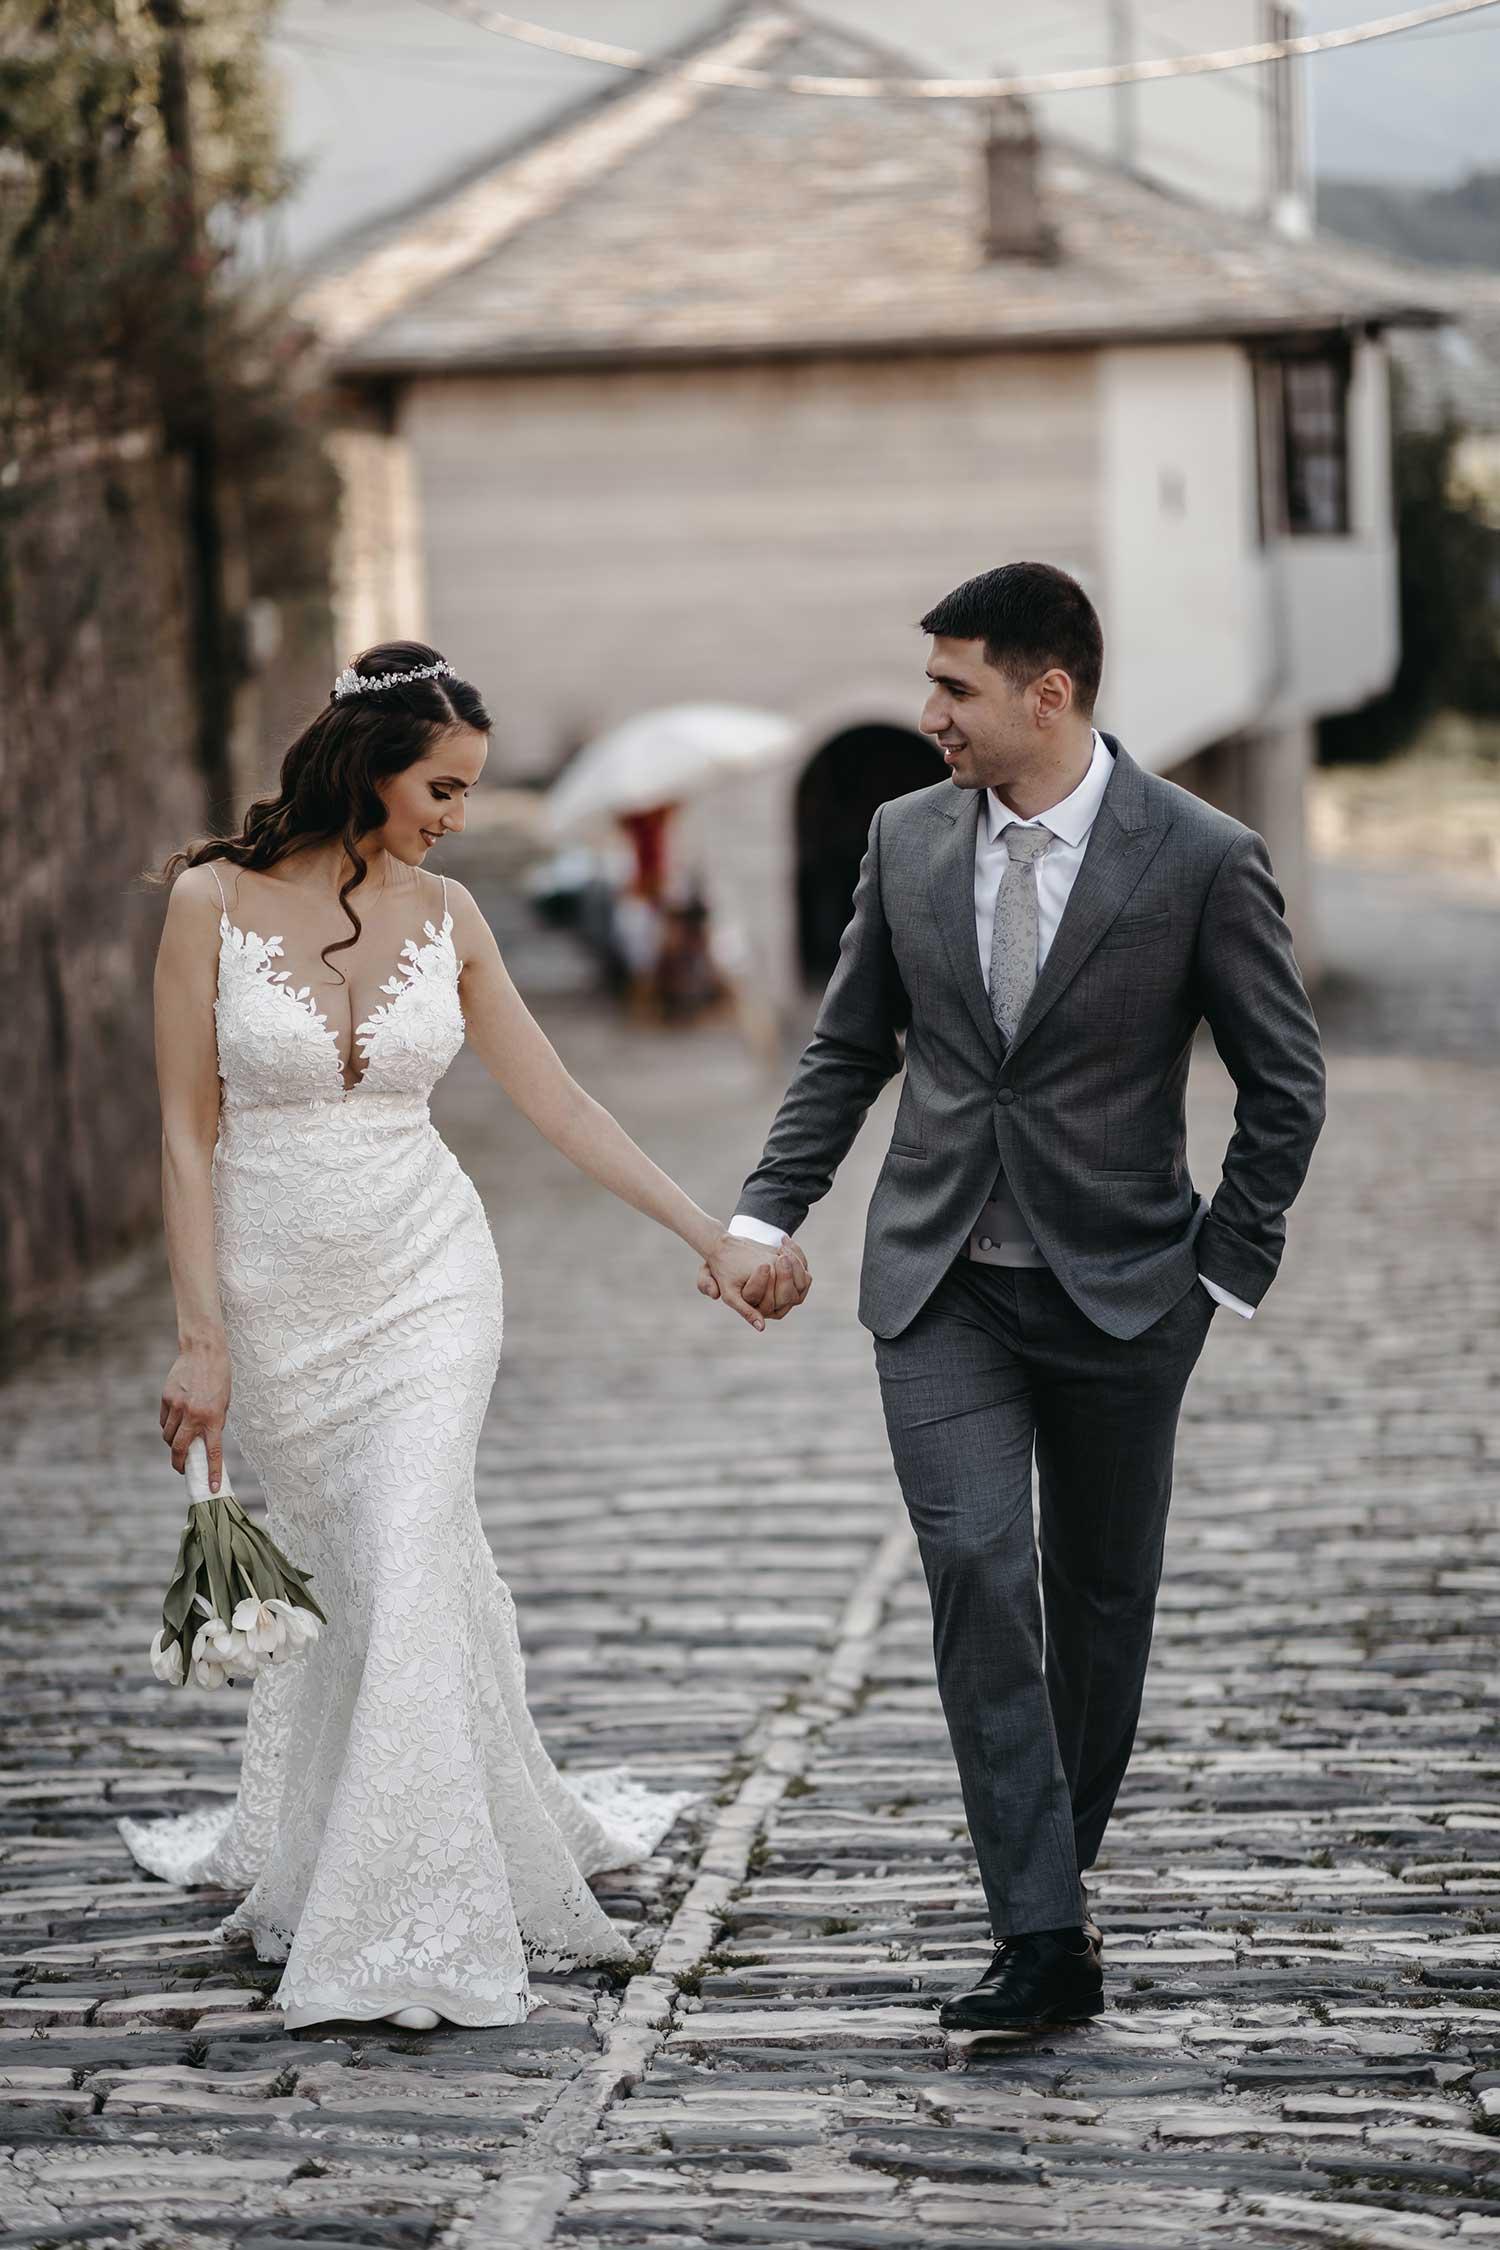 Bride and groom walking down the streets of Gjirokaster